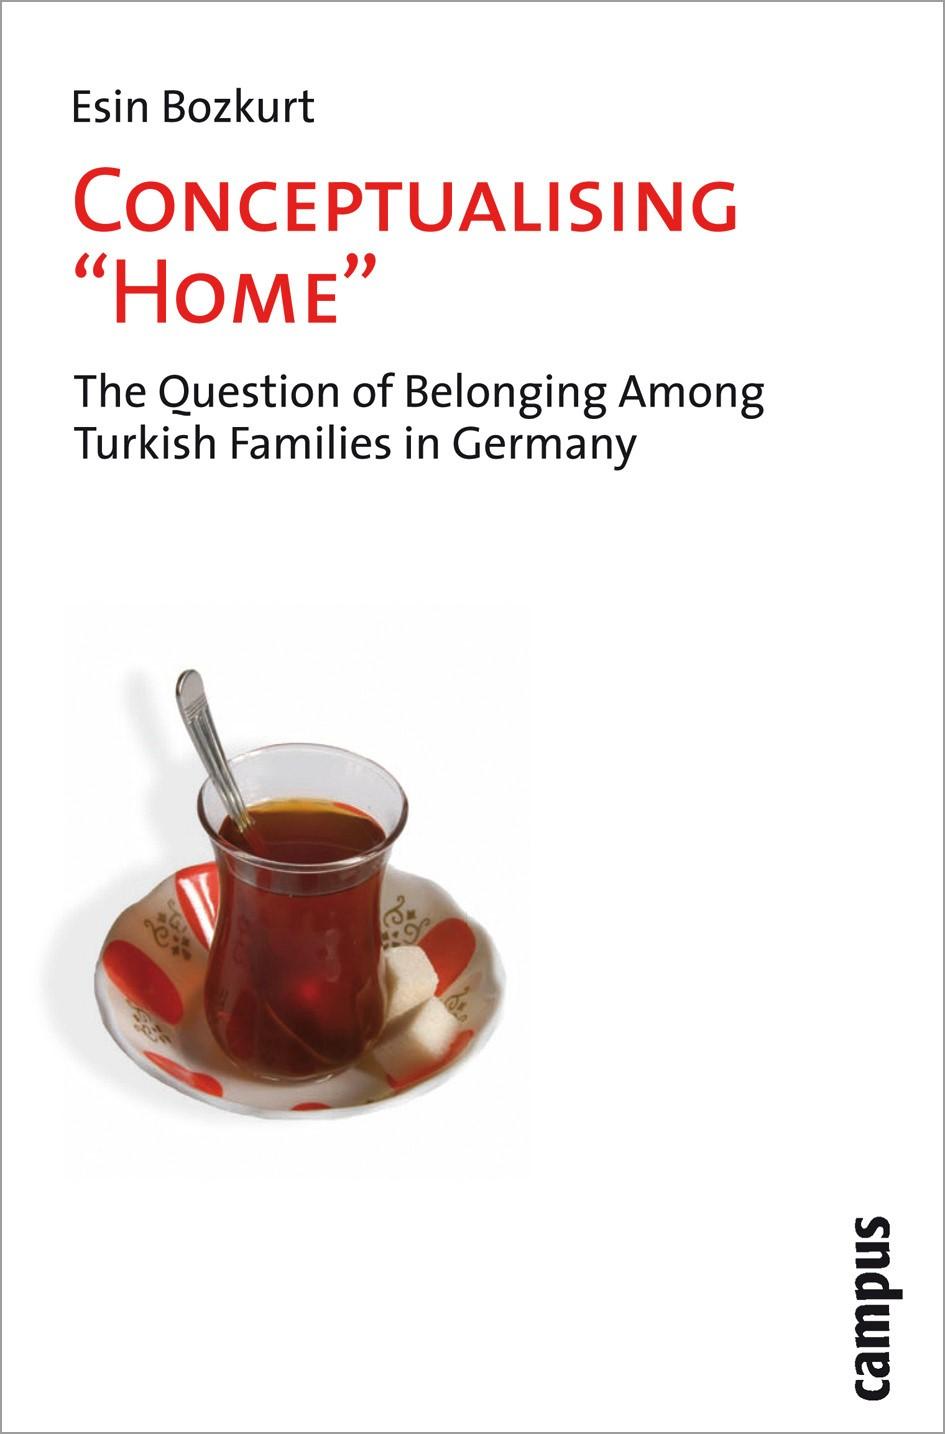 Conceptualising Home | Bozkurt, 2009 | Buch (Cover)